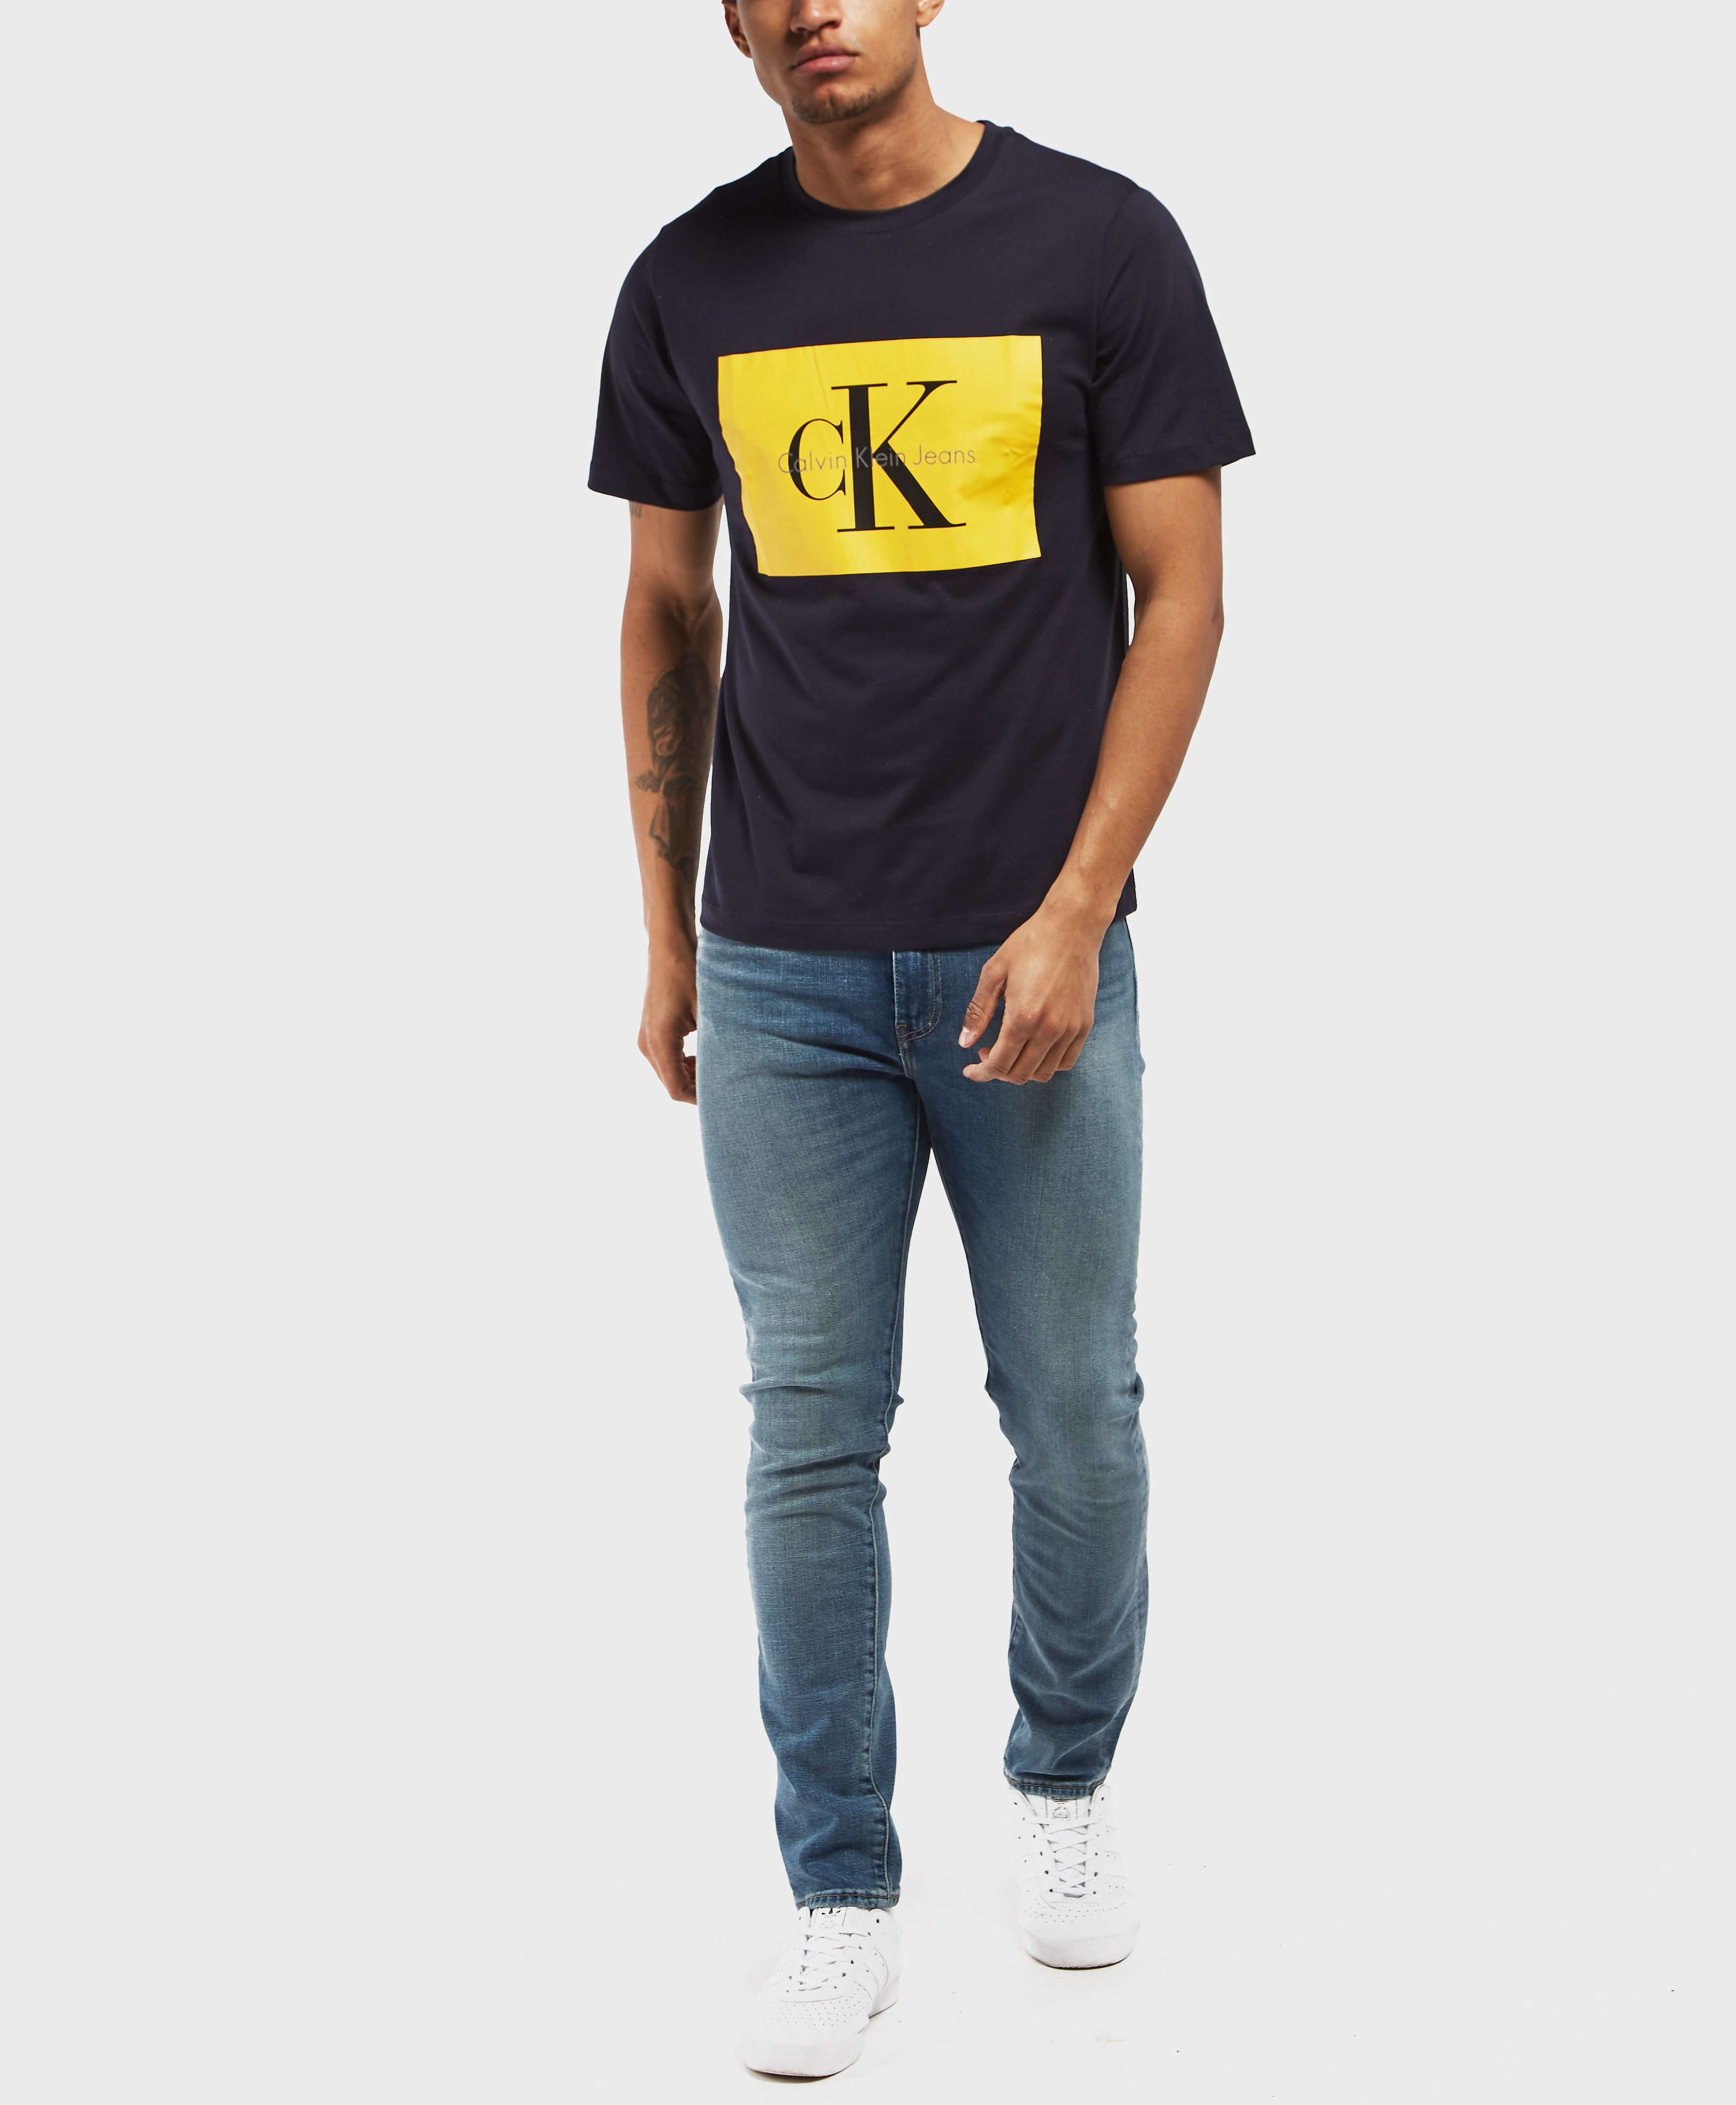 Calvin Klein Box Icon Short Sleeve T-Shirt